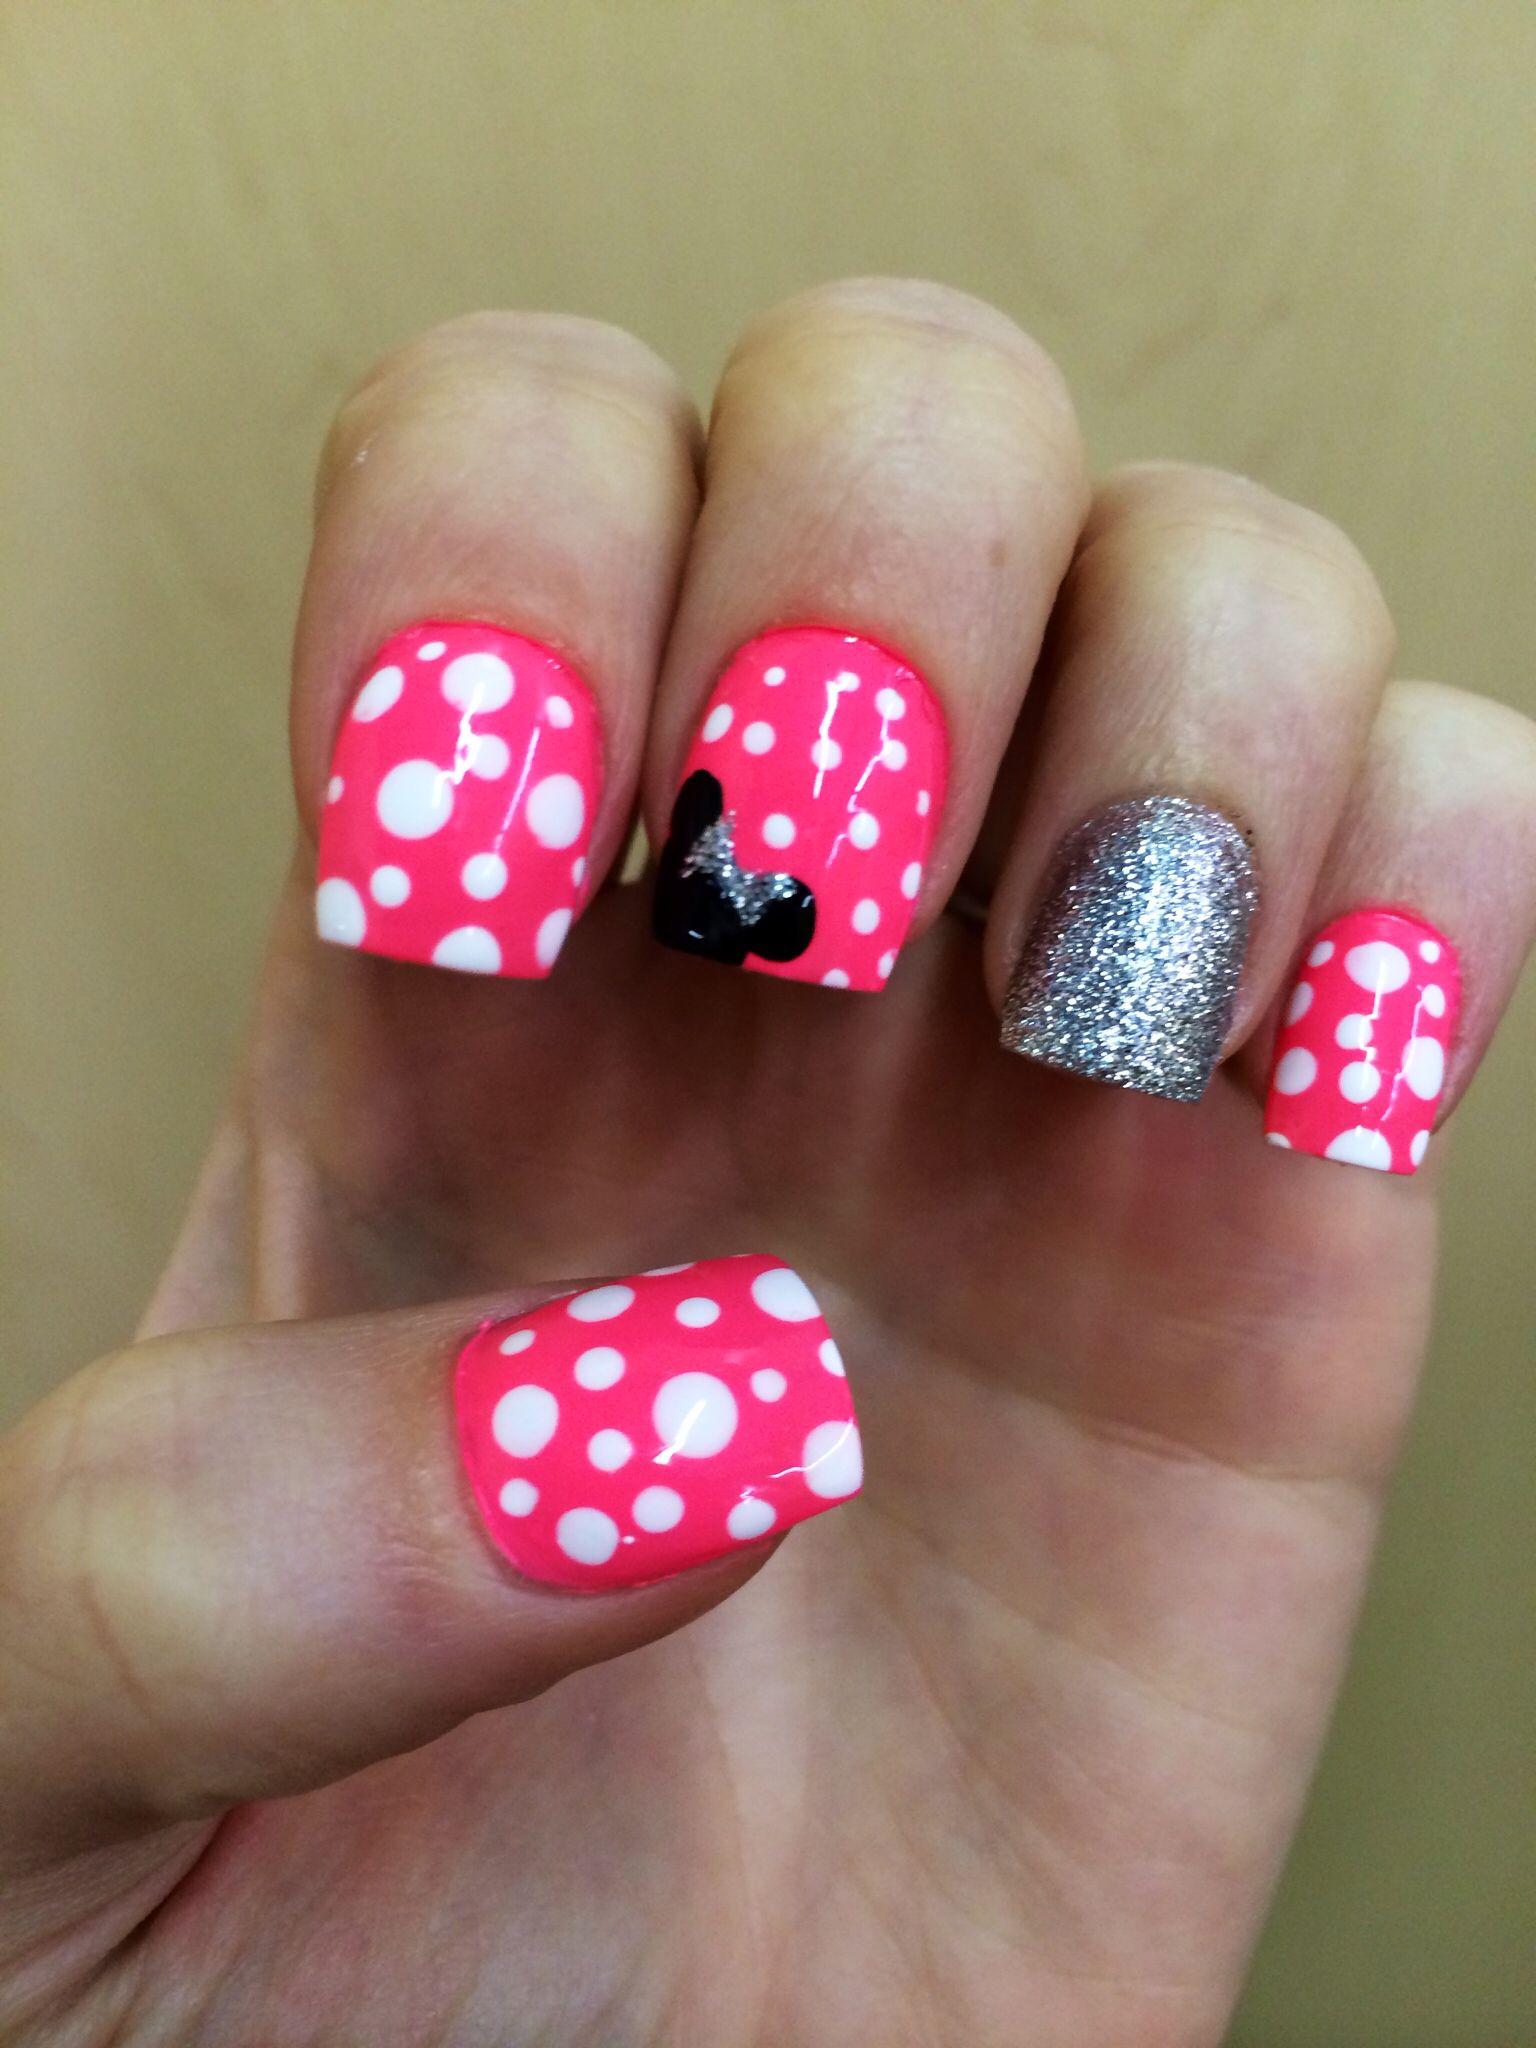 Disney minnie mouse nails nails i 39 ve had pinterest for Acrylic toenails salon